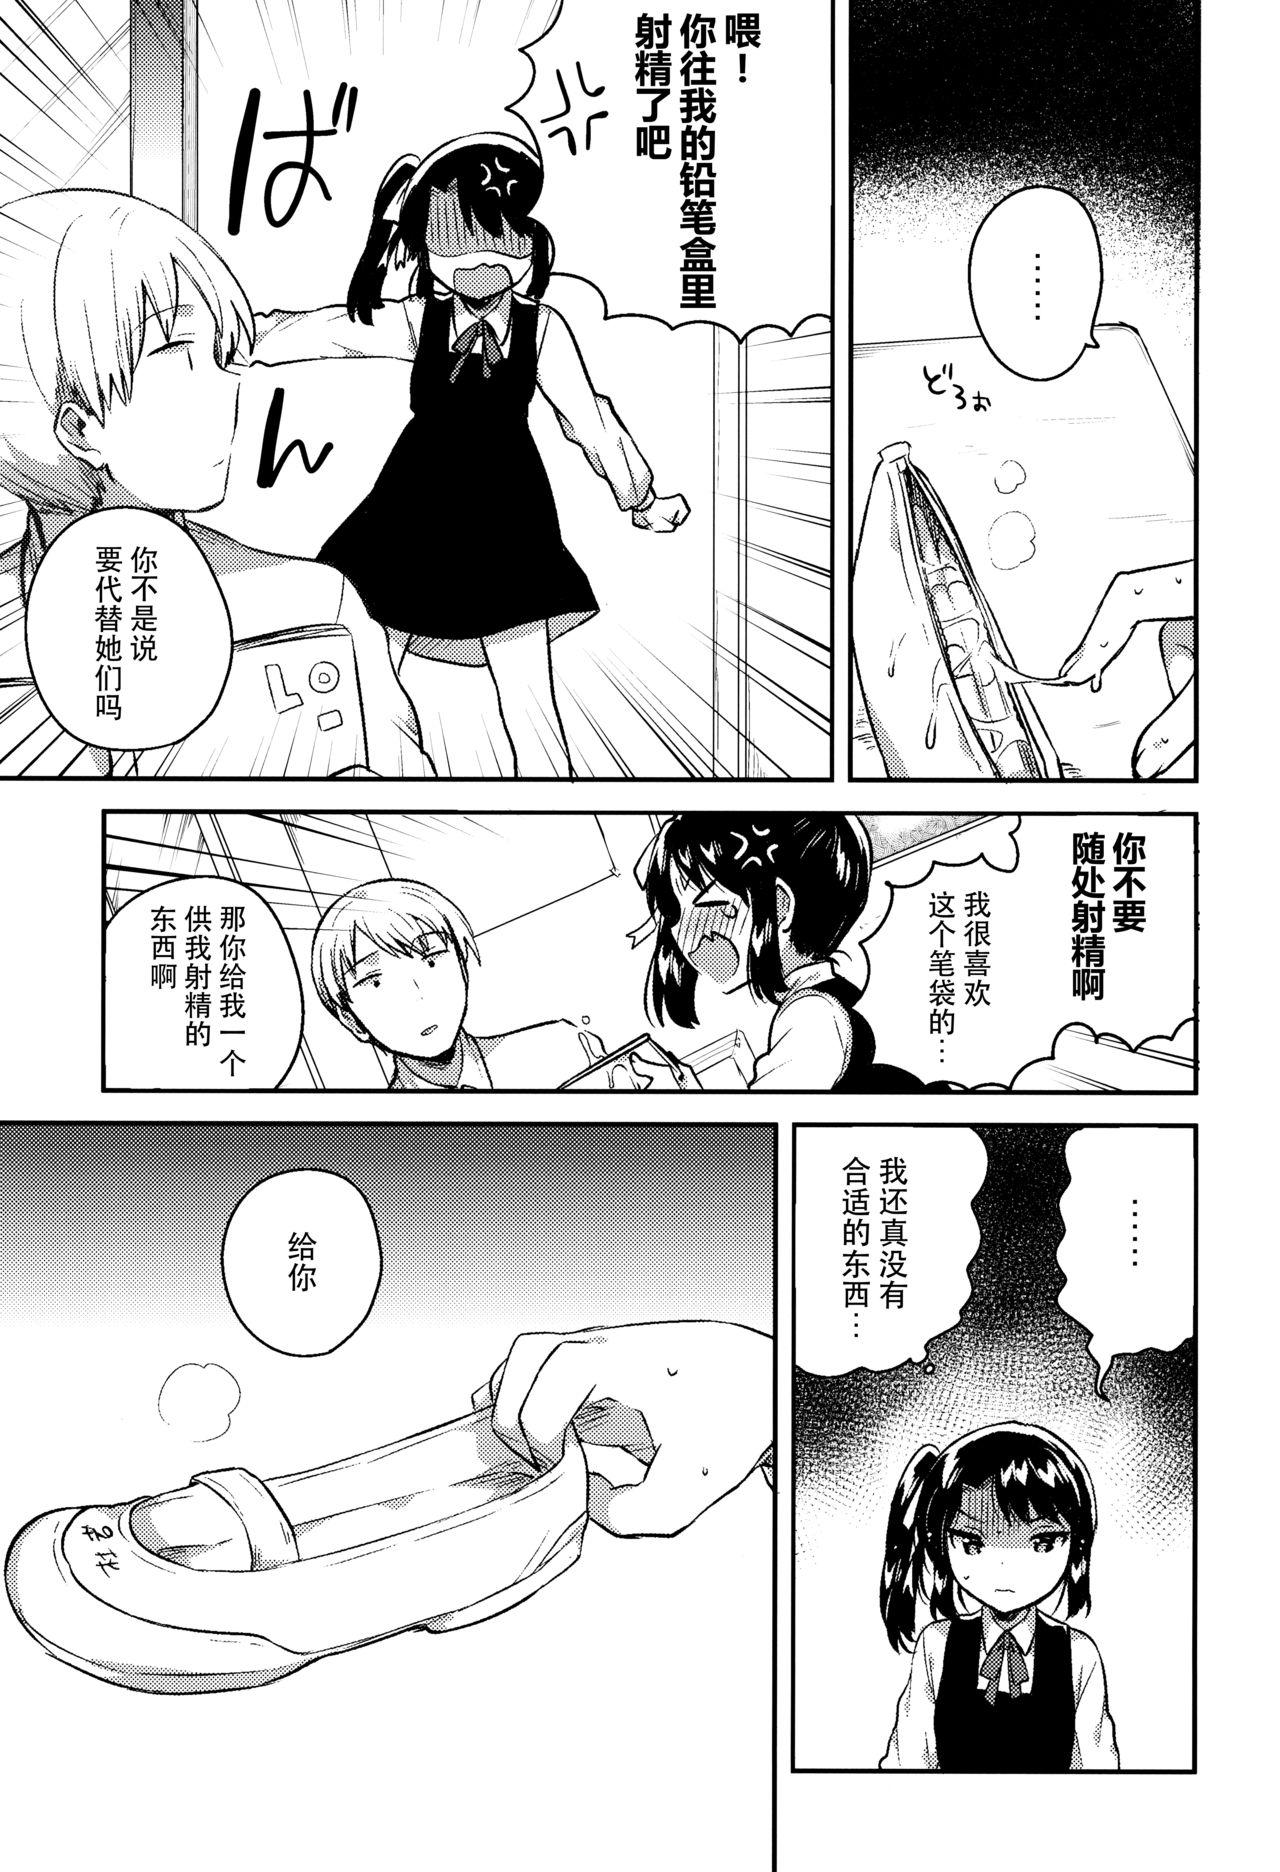 (SC2018 Spring) [squeezecandyheaven (Ichihaya)] Sensei wa Lolicon de Saitei Hentai no Gomikuzu [Zen] + Omake [Chinese] [脸肿汉化组] 12